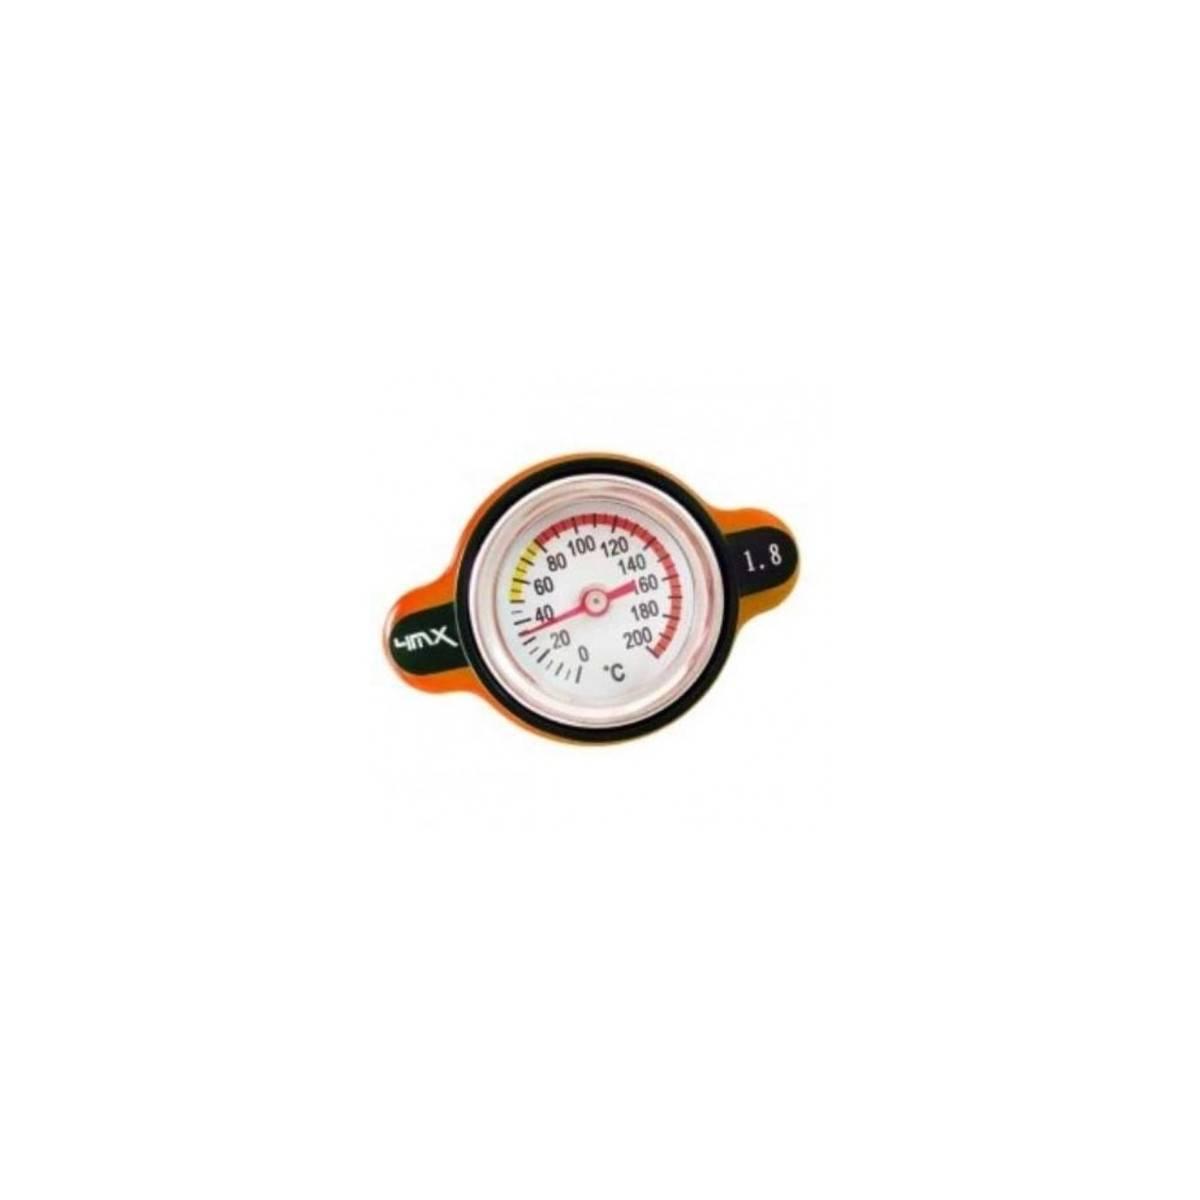 4MXK18-NR - Tapon Radiador 4Mx Con Temperatura Europea Naranja